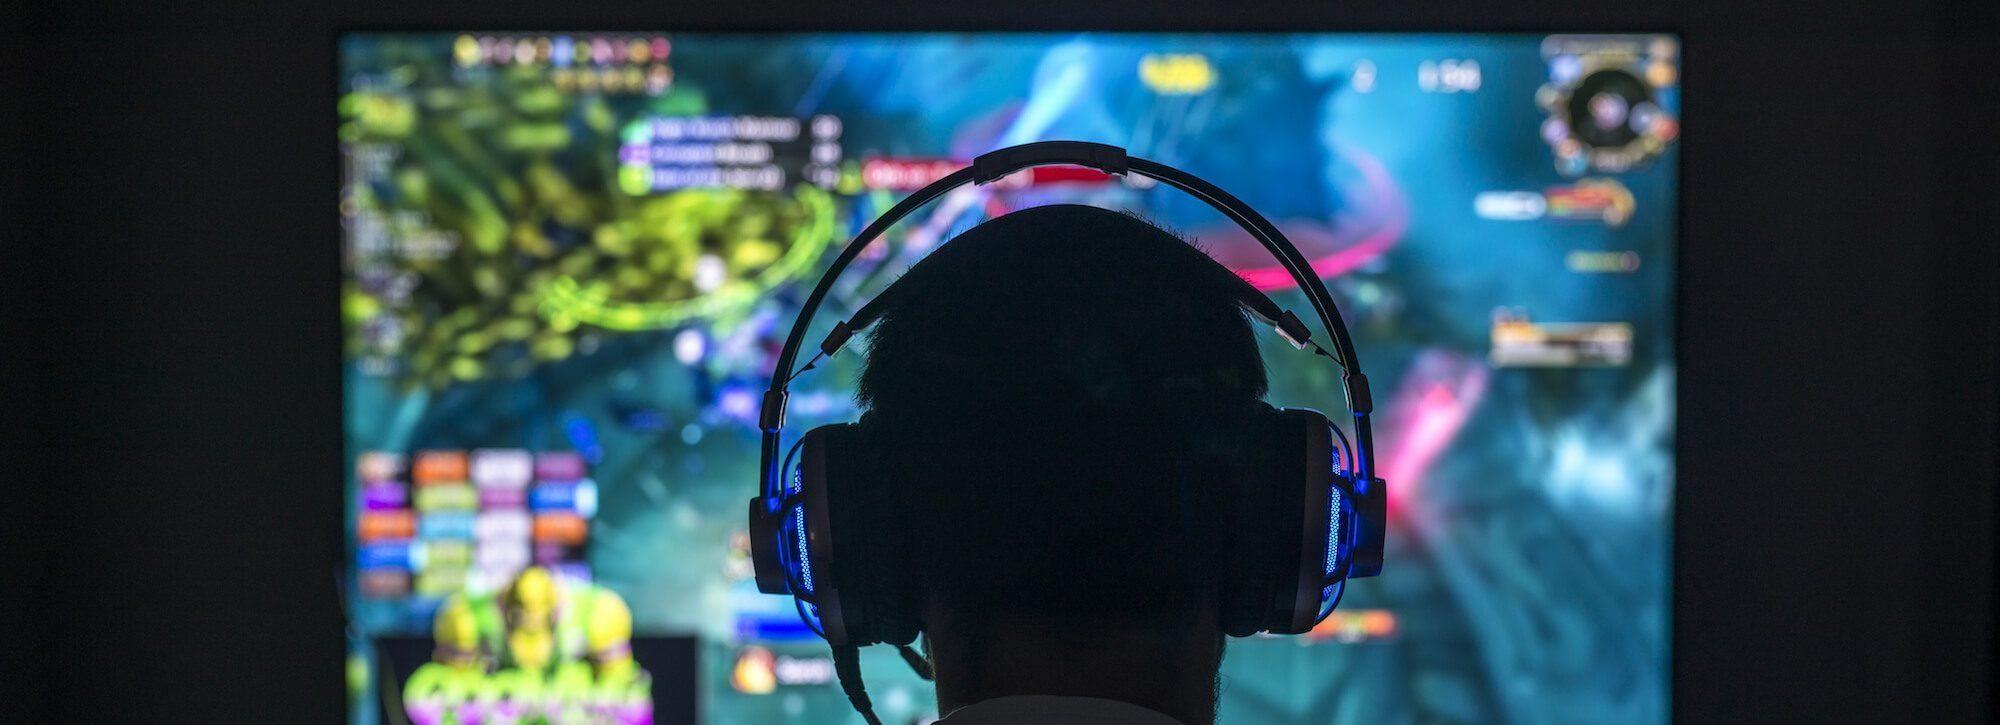 Head looking monitor PC